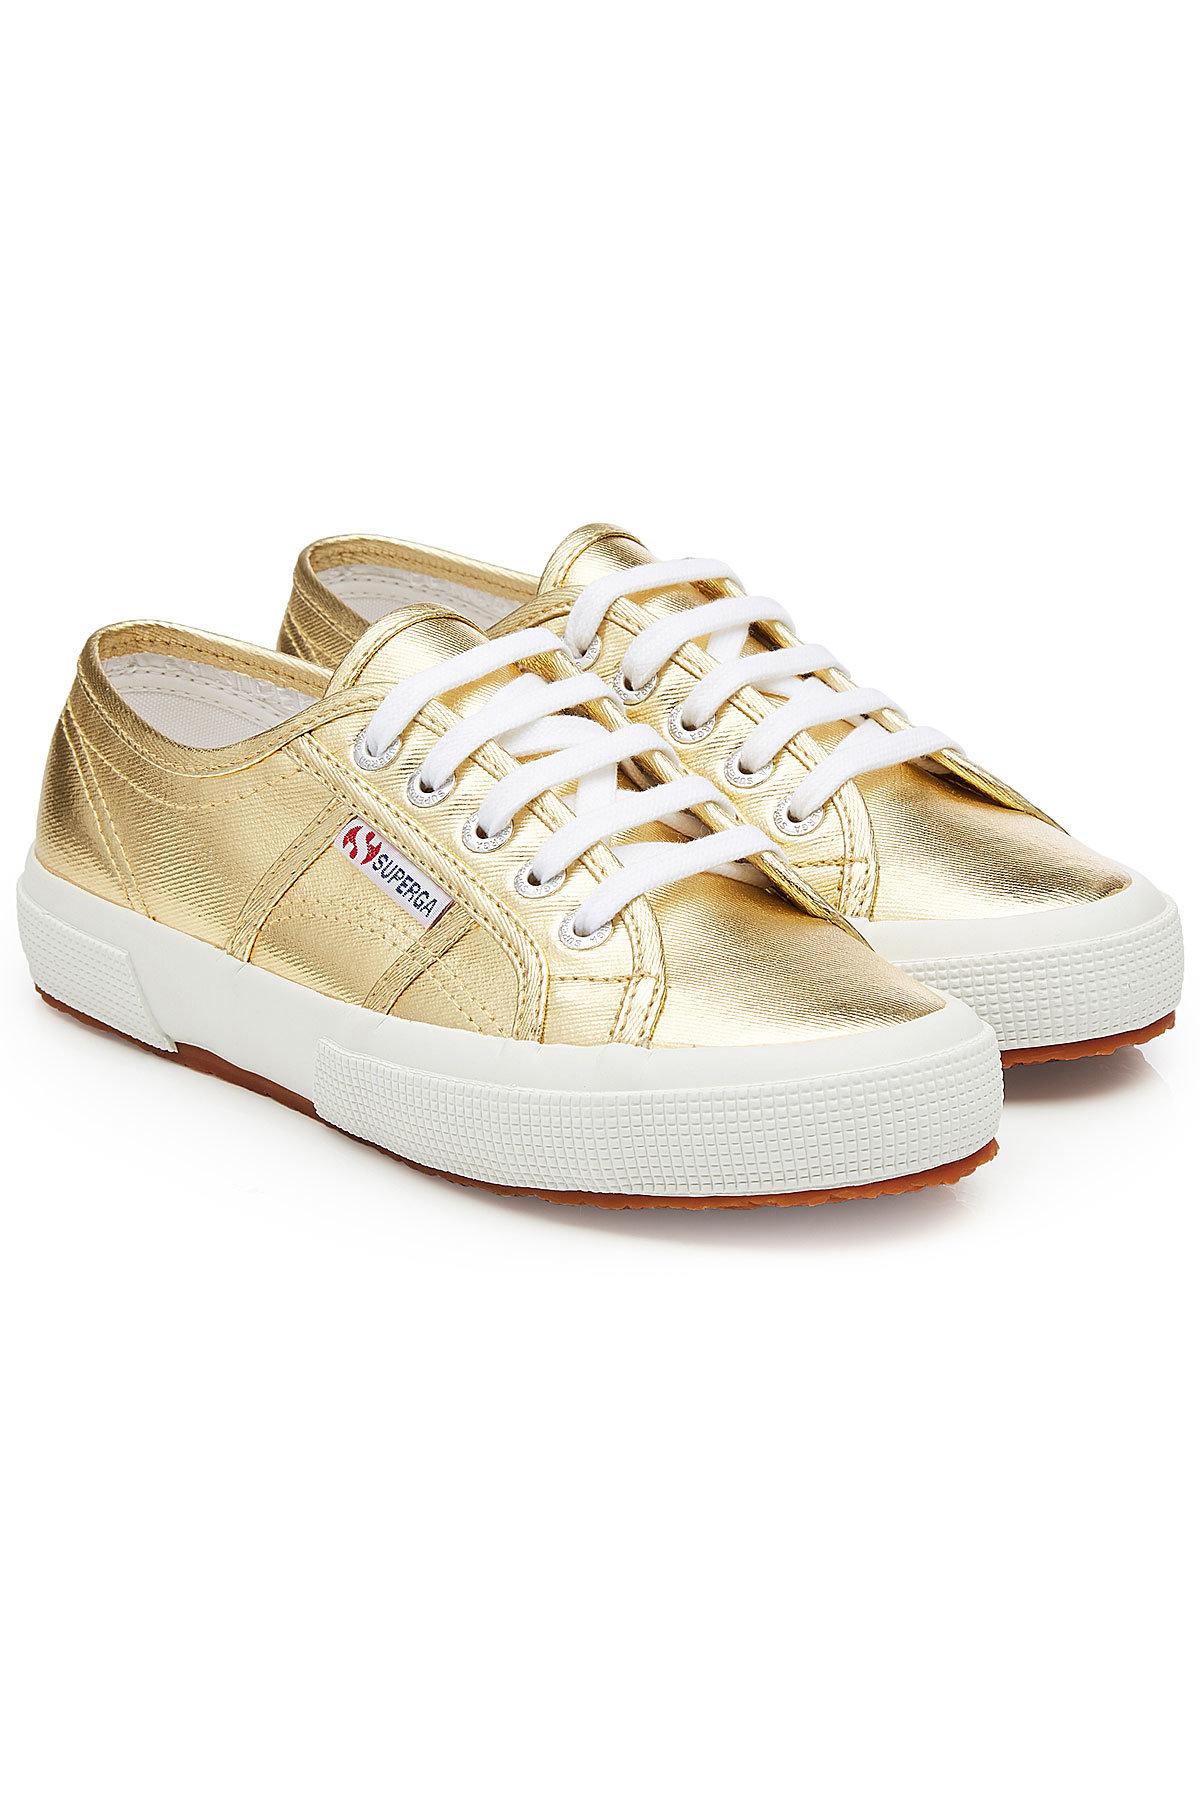 Superga 2750 Cotmetu Metallic Canvas Sneakers Gr. EU 38 wmU1vJ4AW0